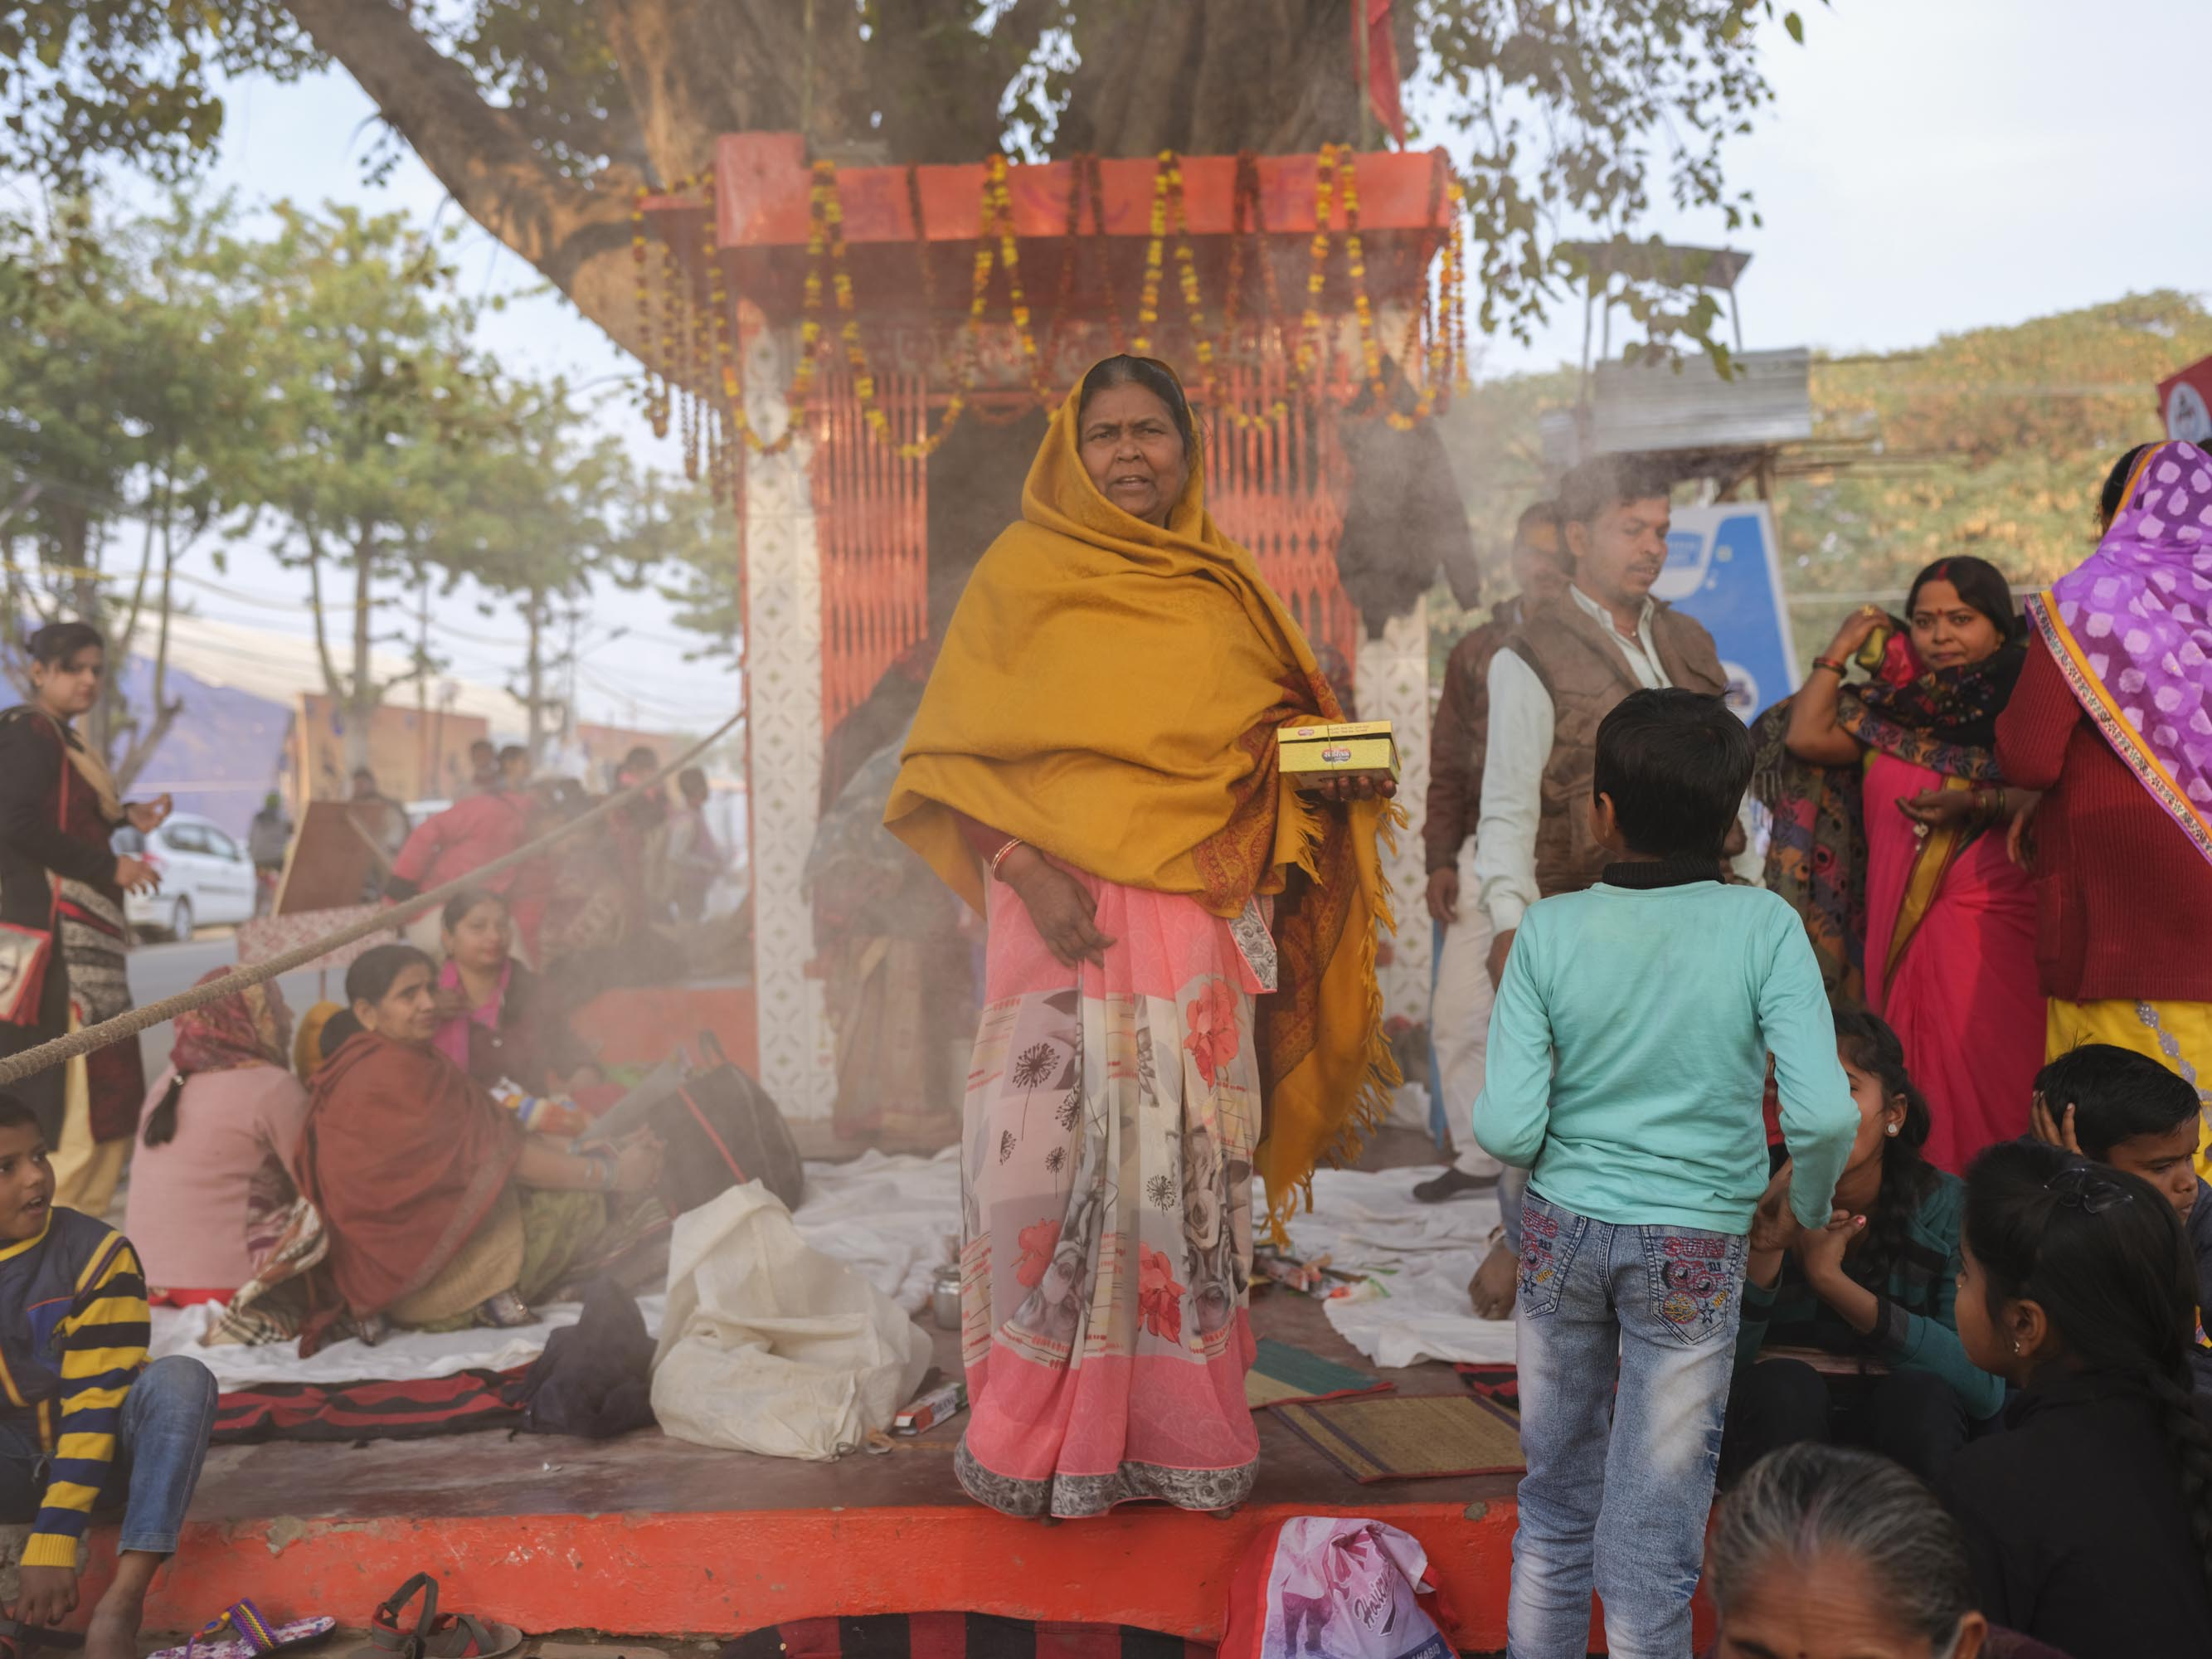 small temple celebration women kids pilgrims Kumbh mela 2019 India Allahabad Prayagraj Ardh hindu religious Festival event rivers photographer jose jeuland photography